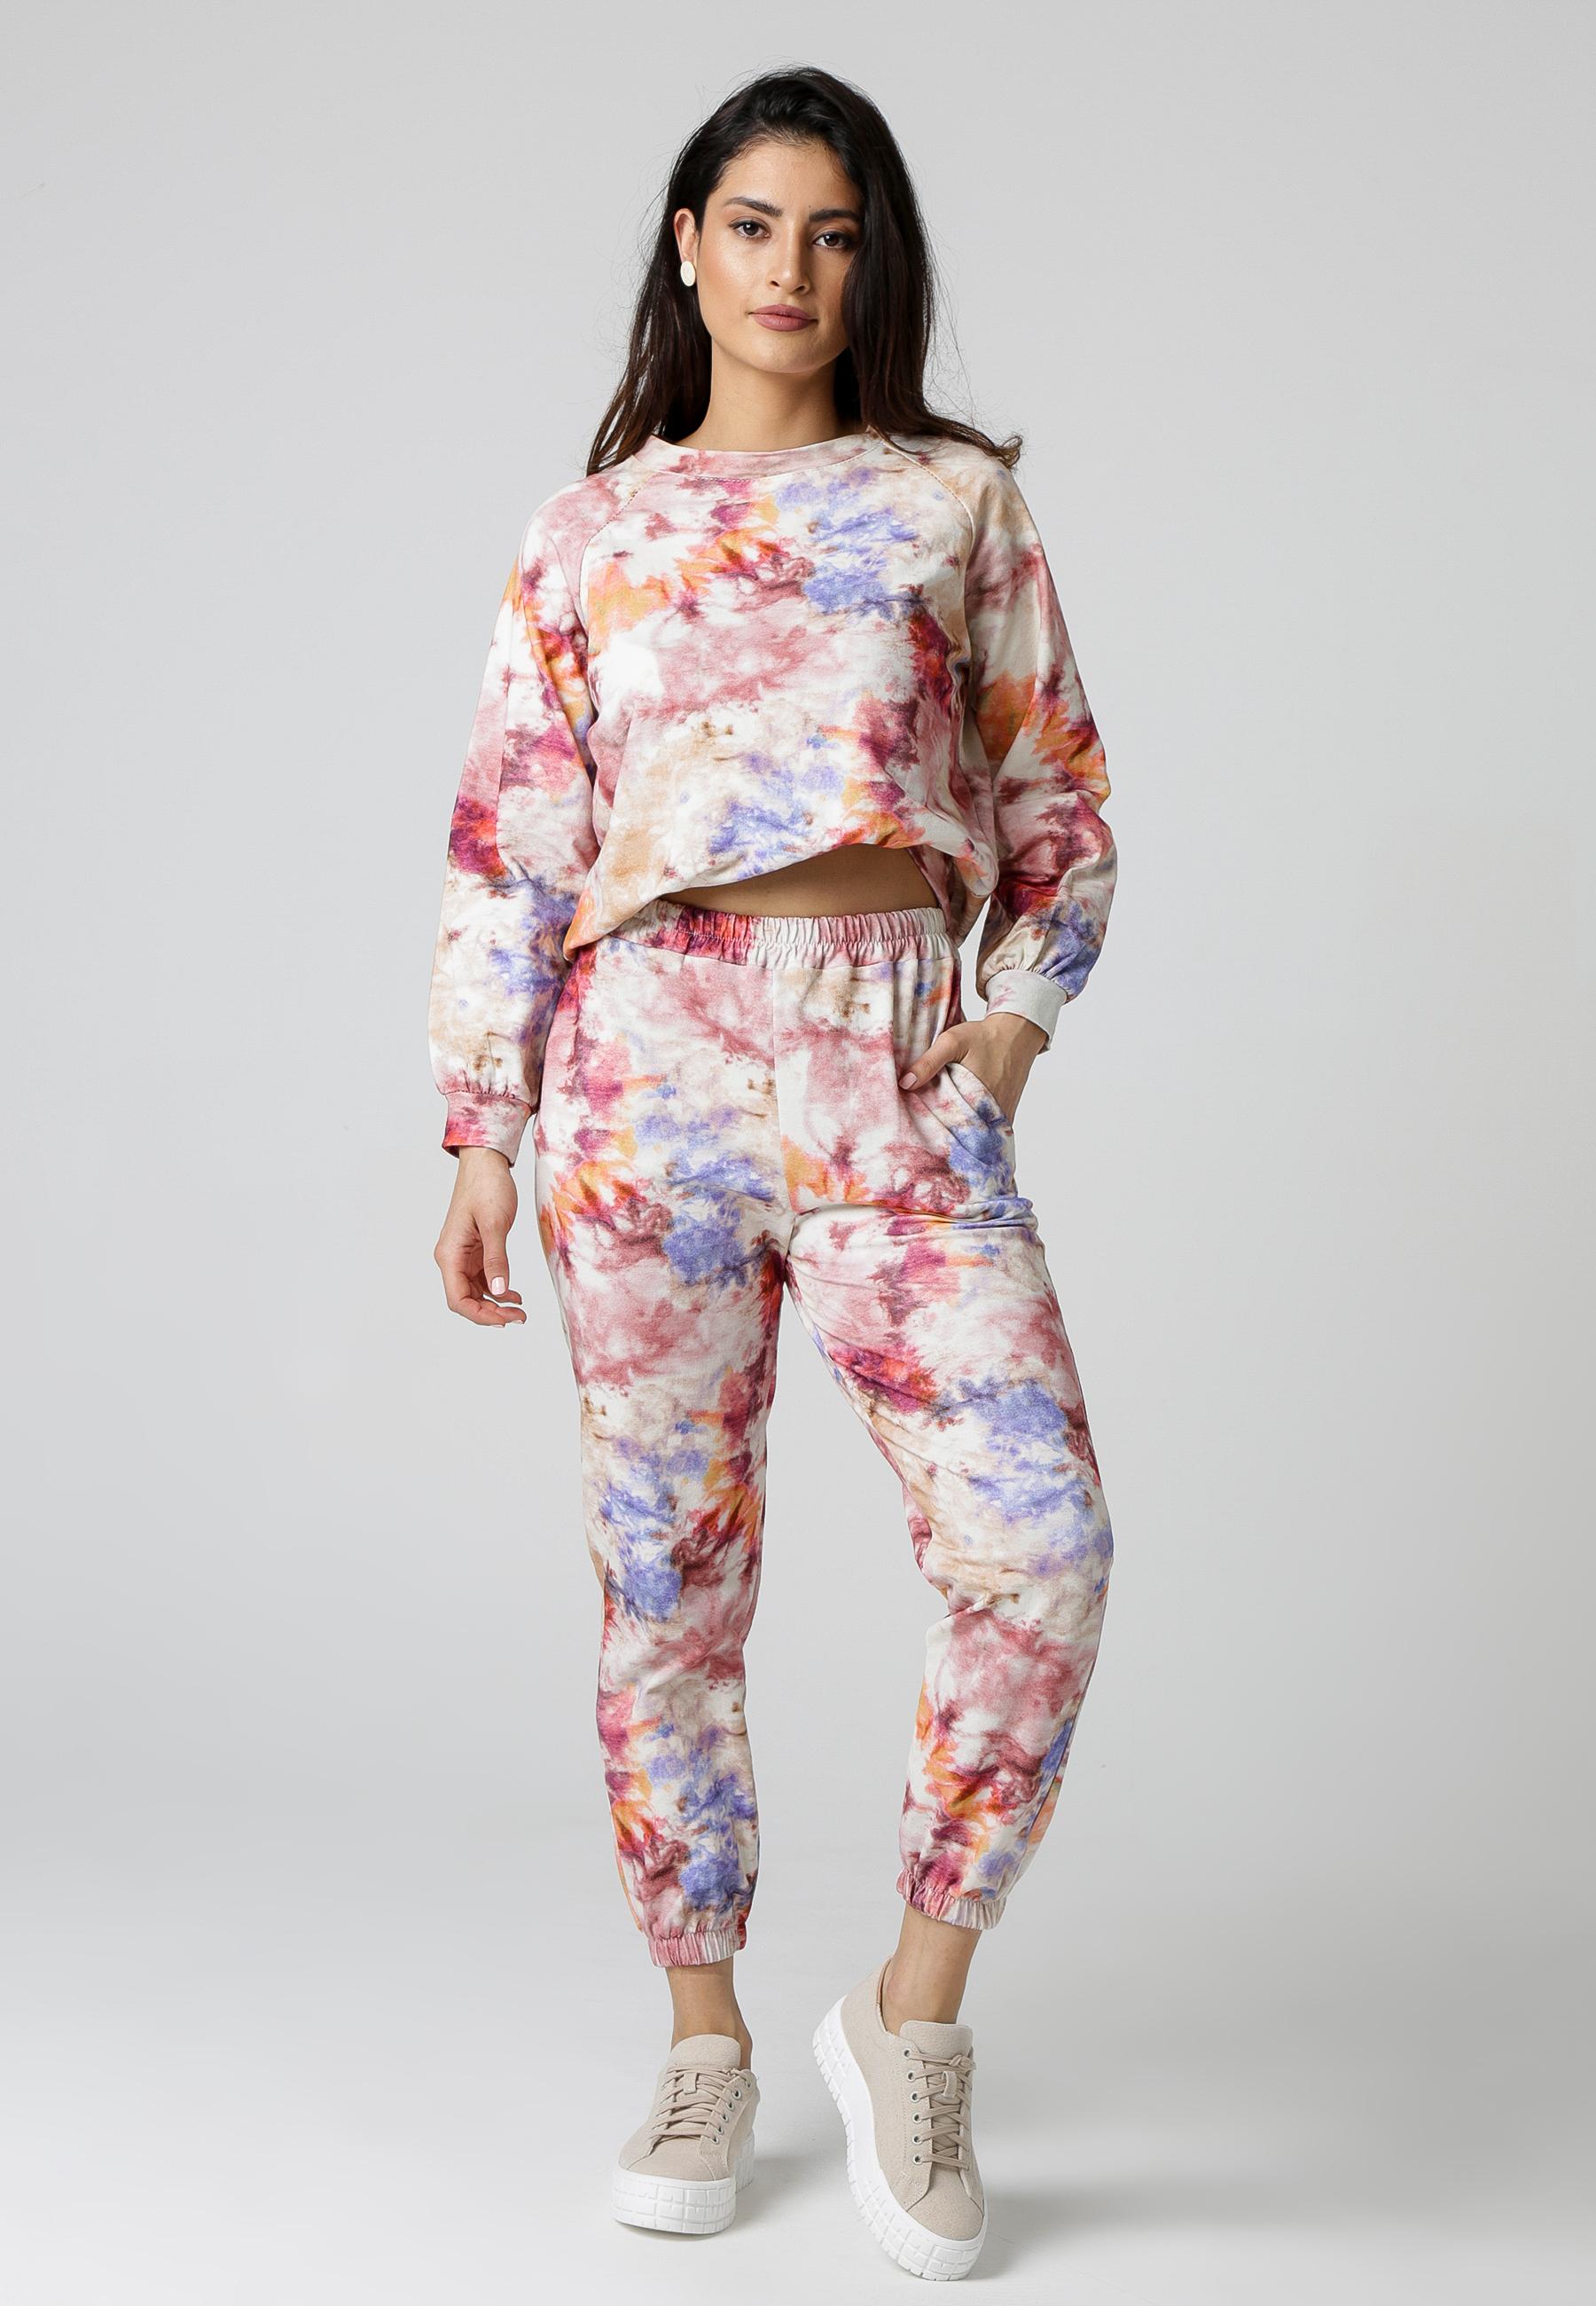 MiaZAYA Sweater Batik